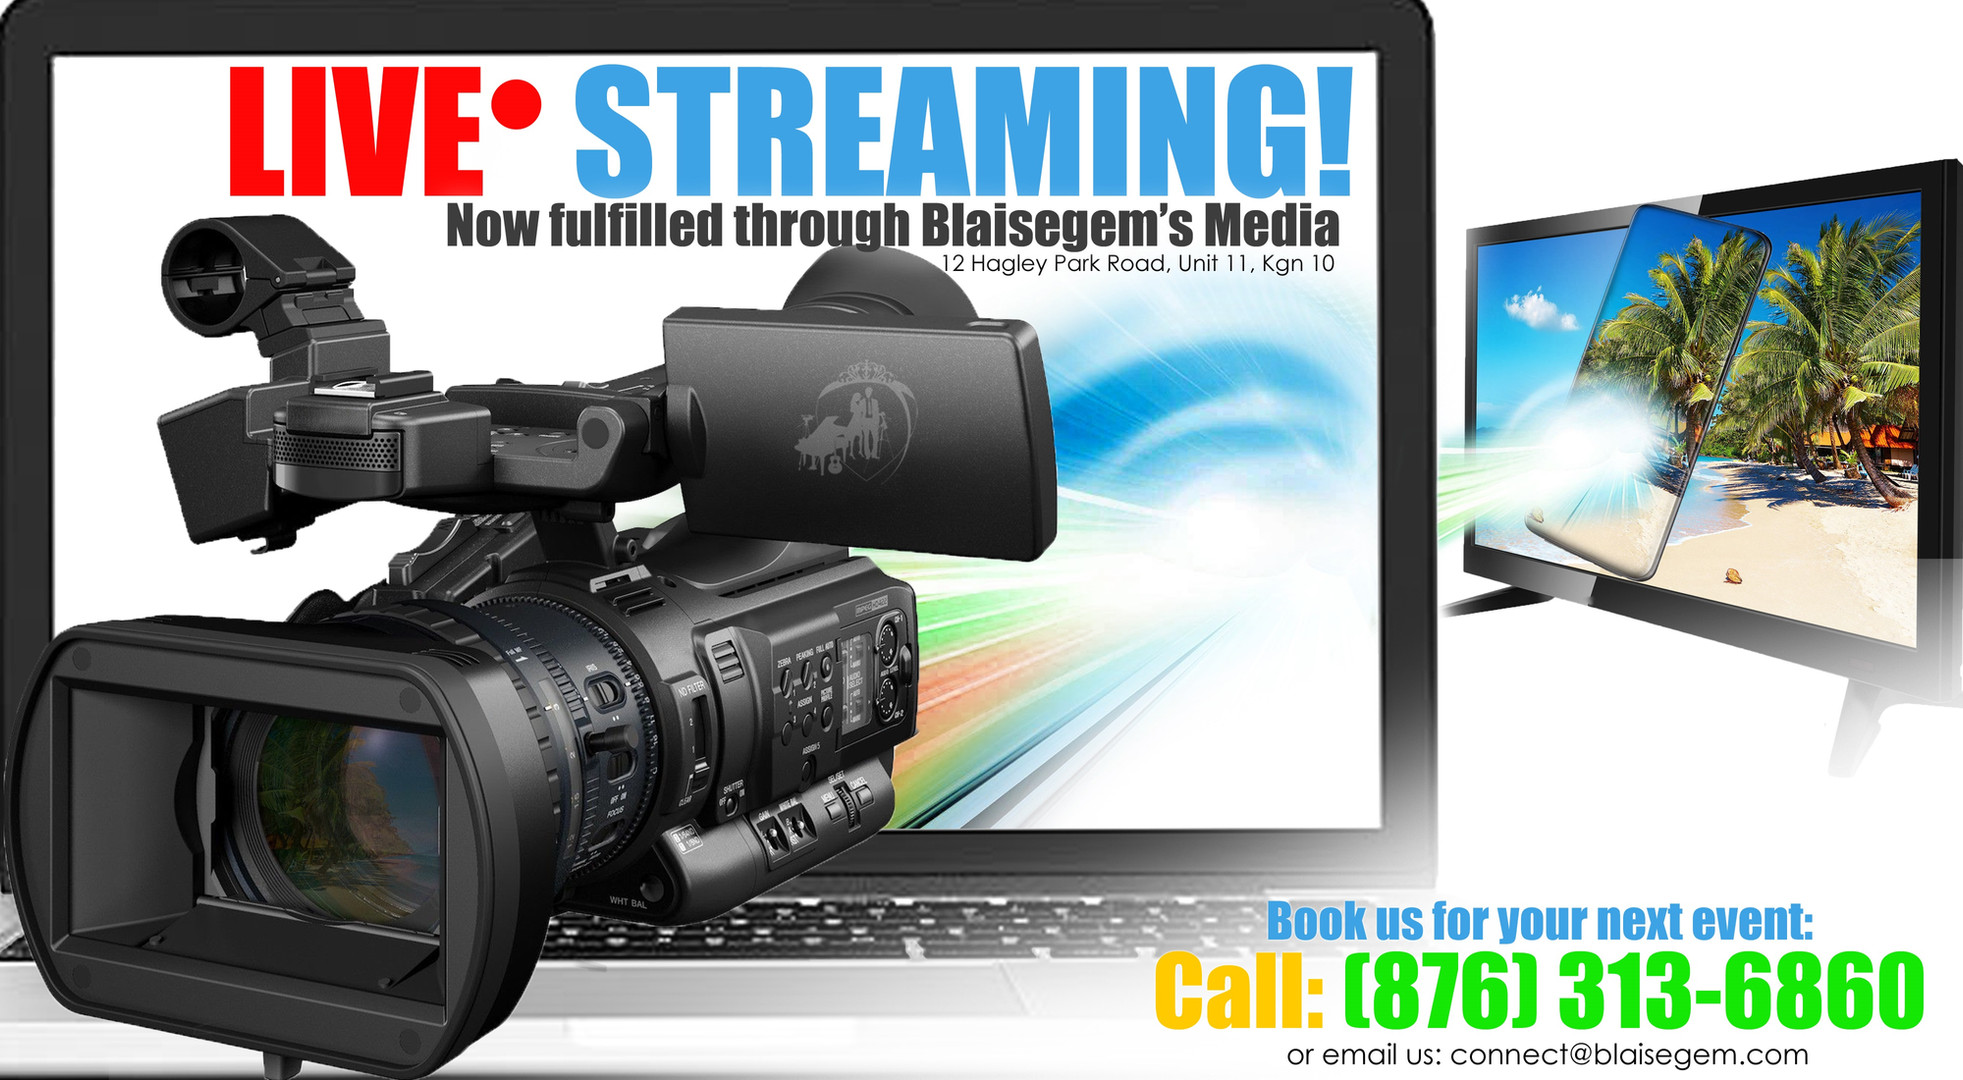 Get your events streamed live by Blaisegem Media